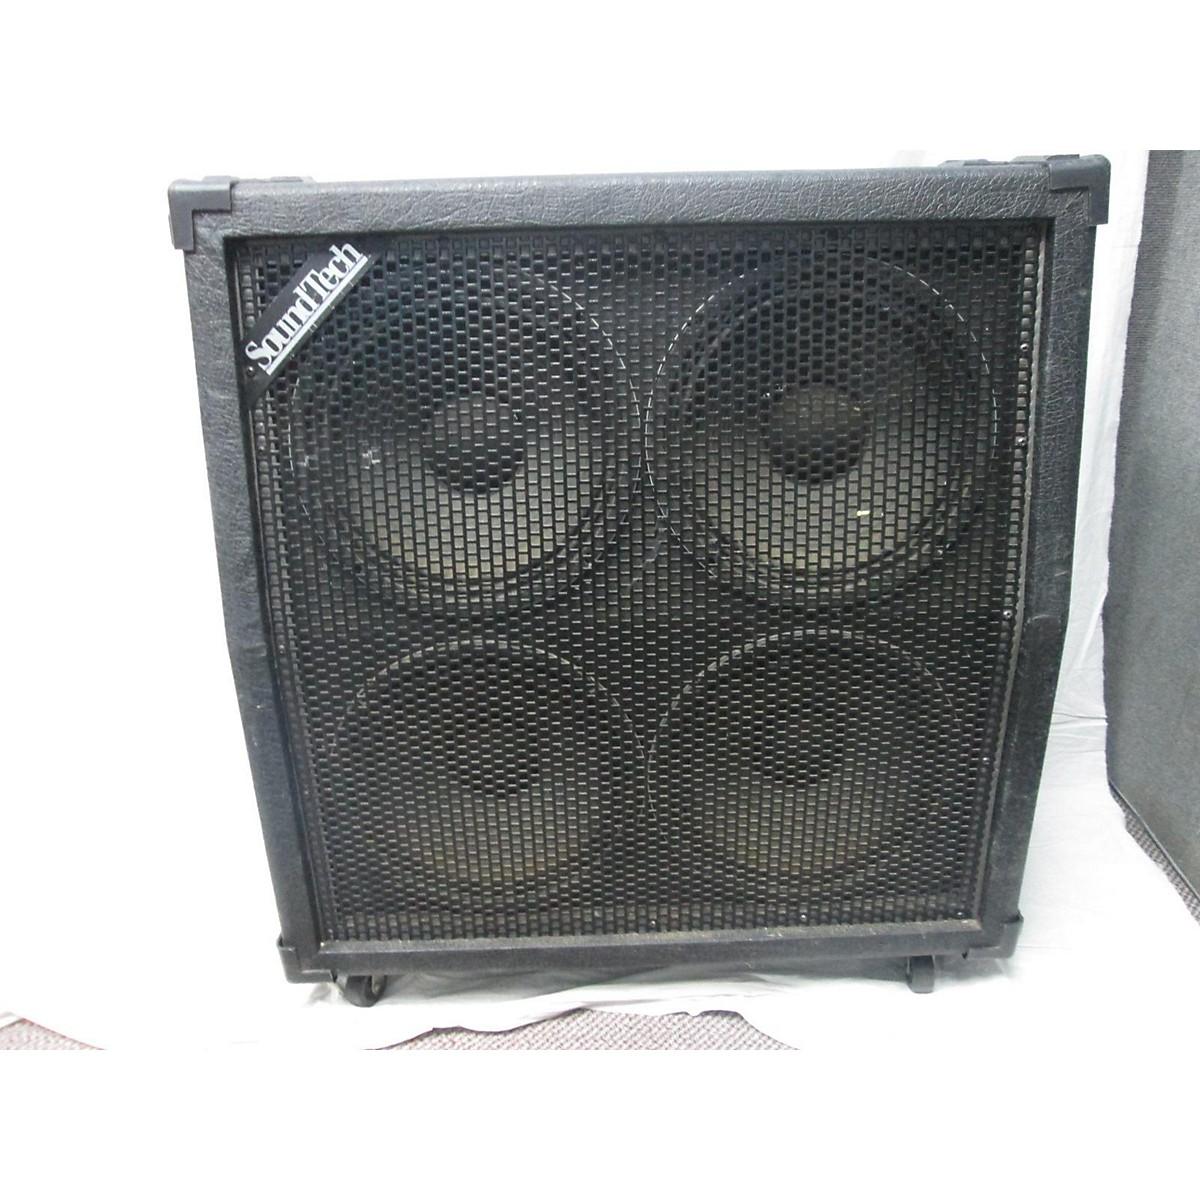 SoundTech 412 Guitar Cabinet